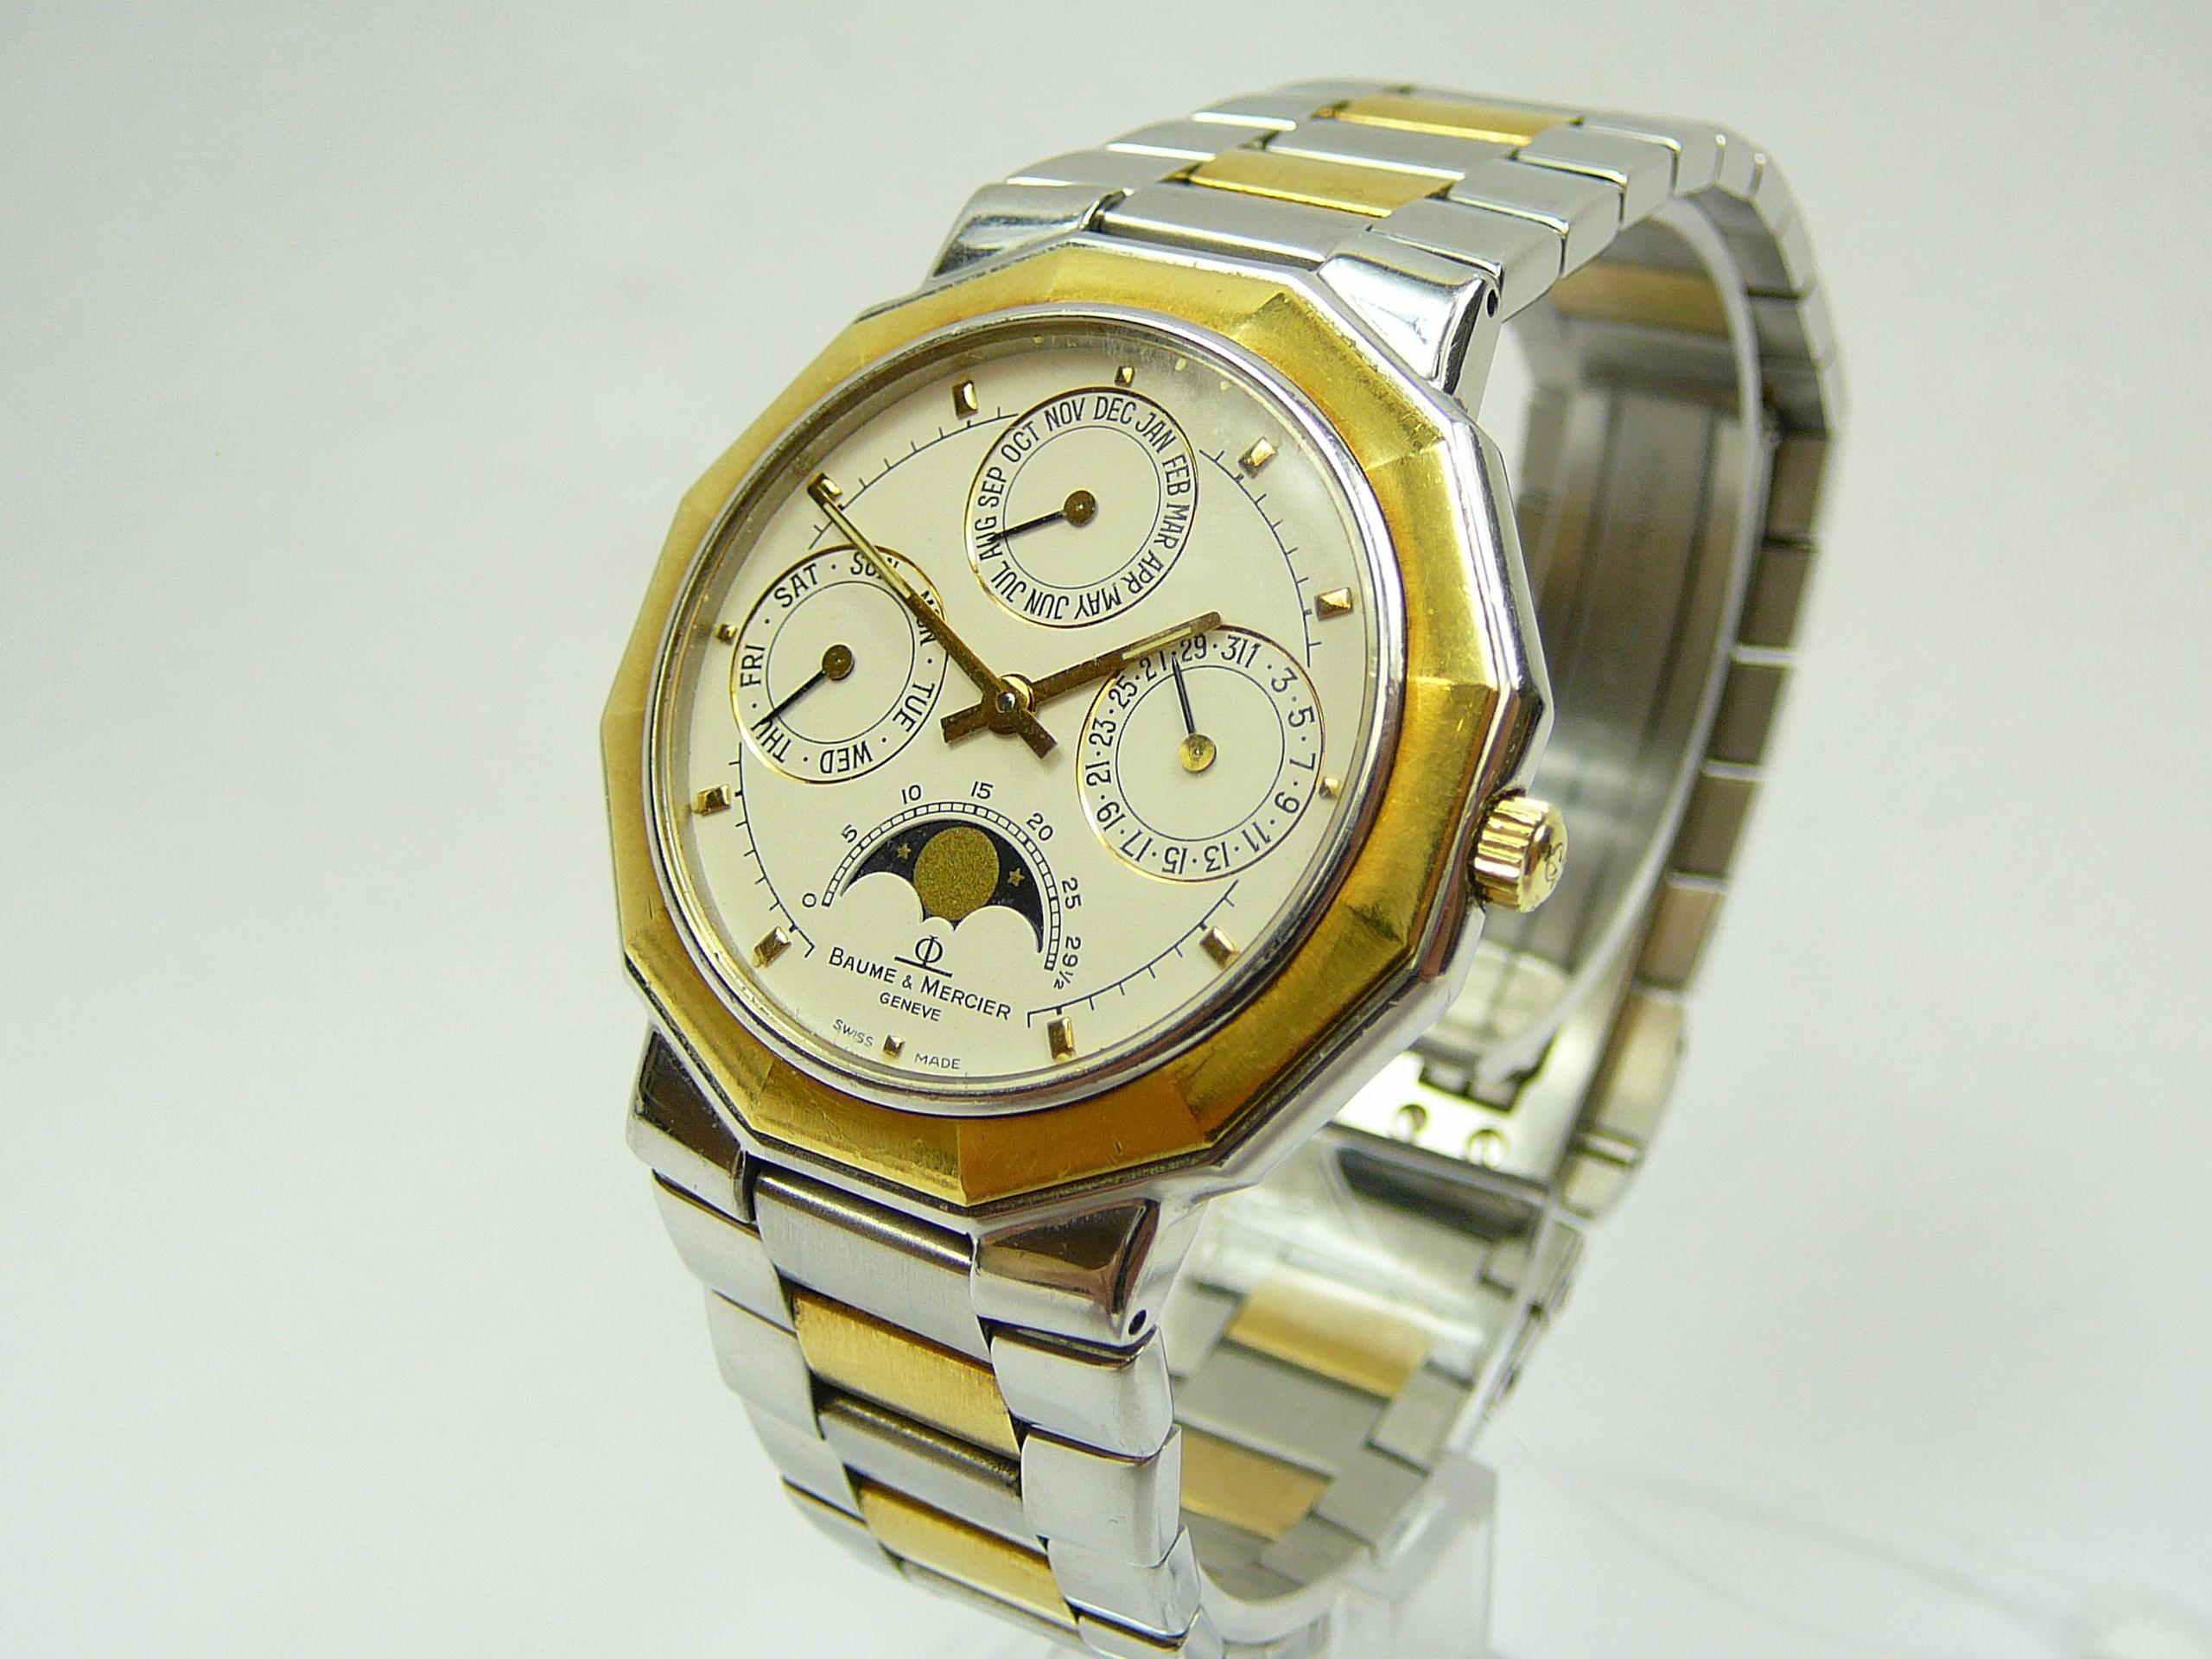 Lot 17 - Gents Bauer & Mercier Wrist Watch